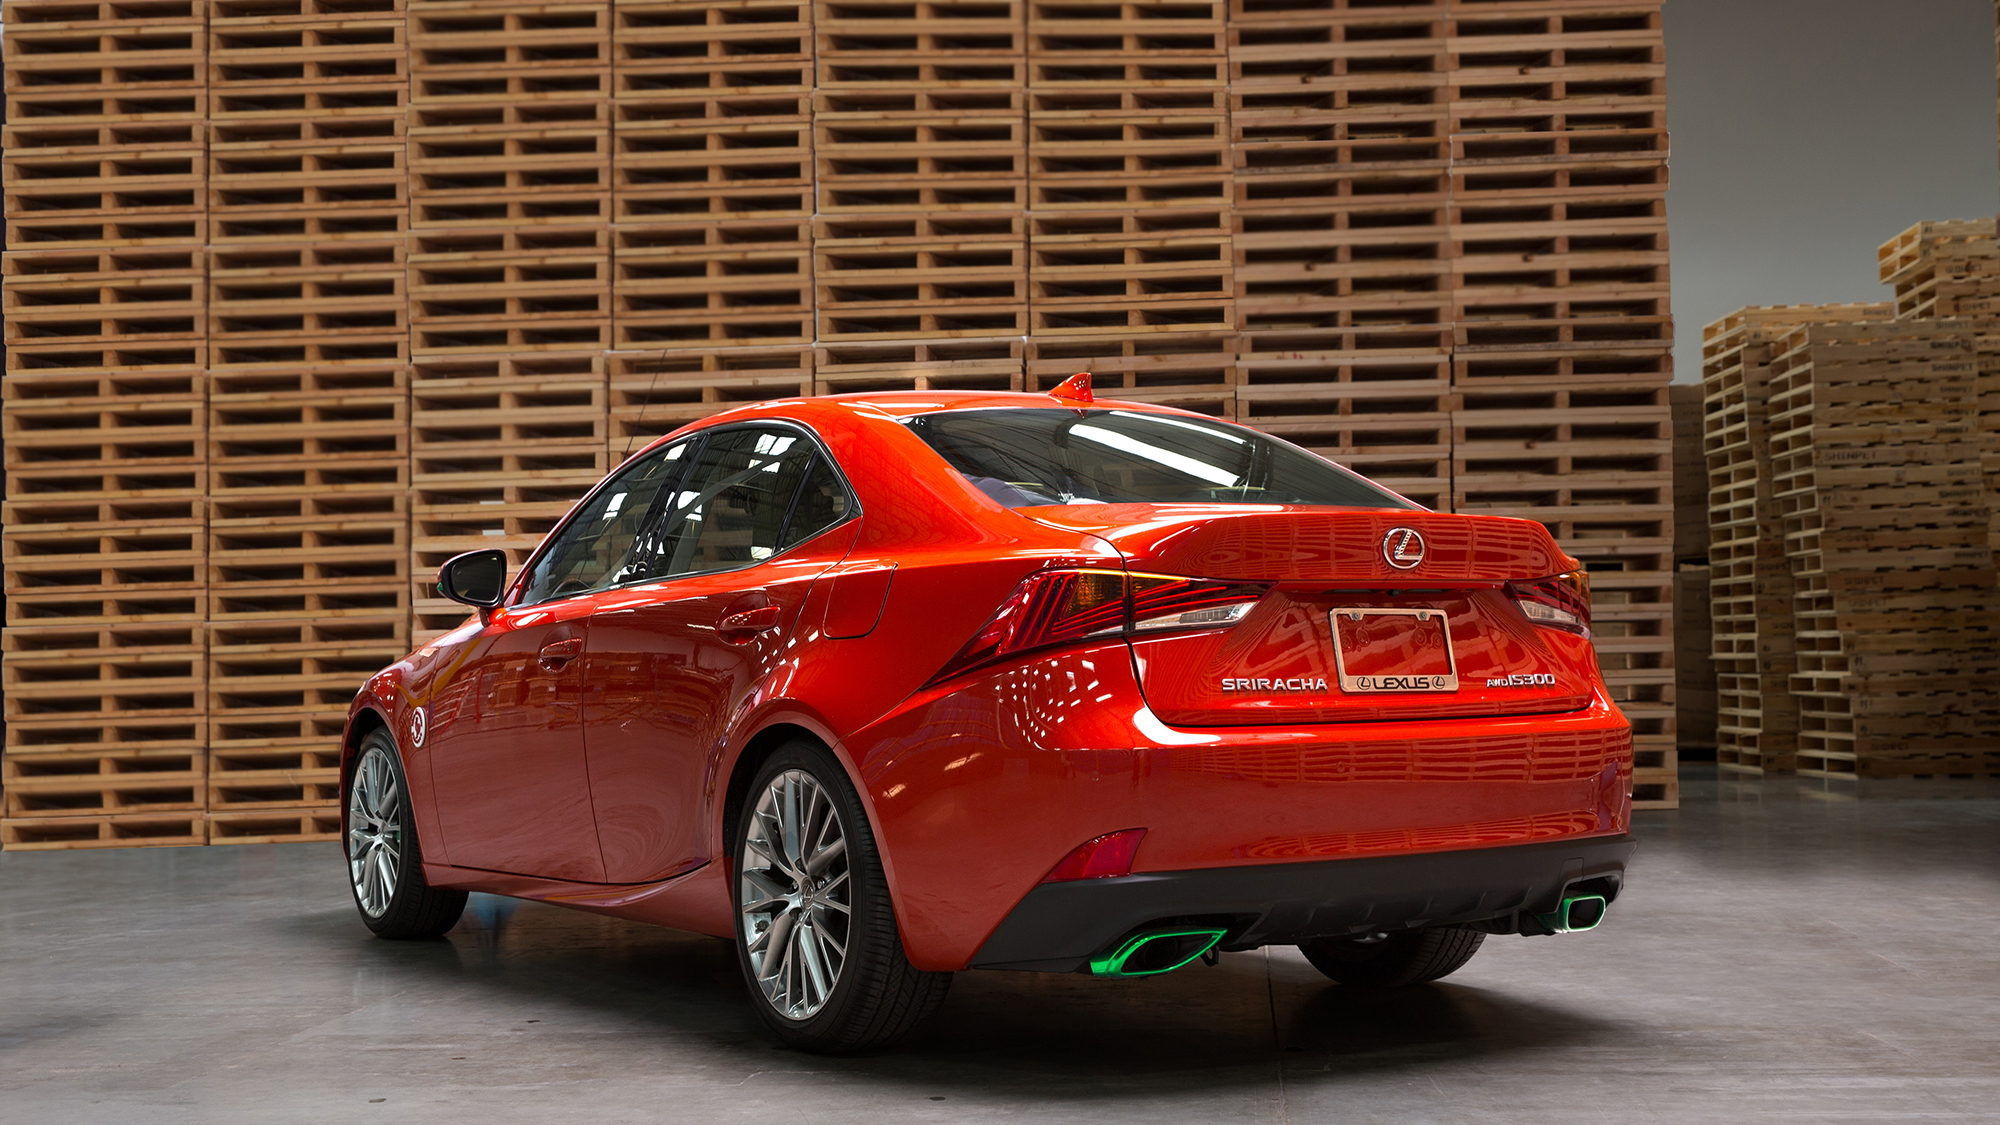 Lexus Siracha IS